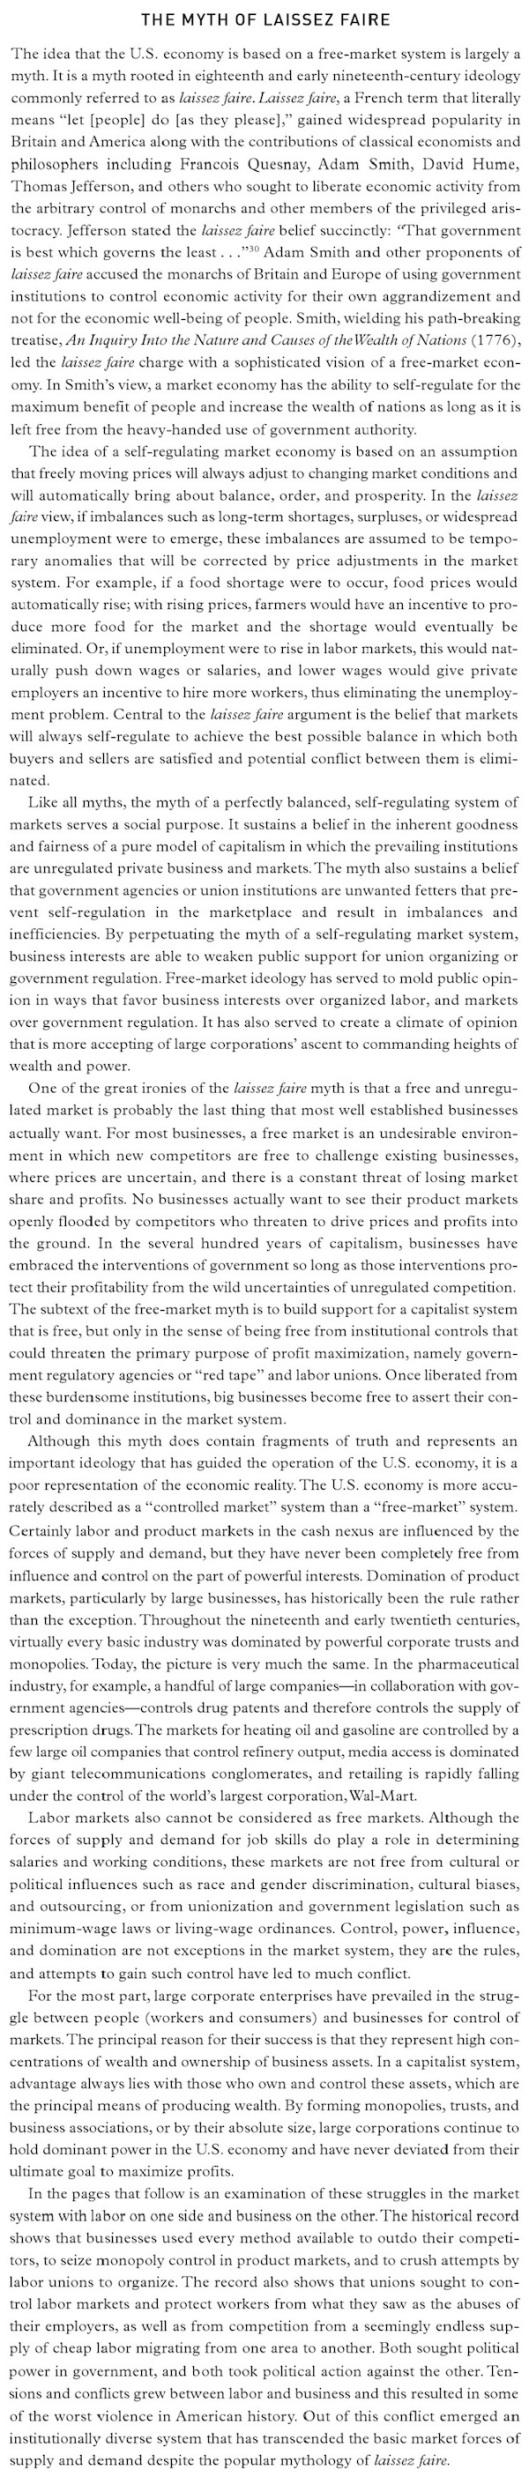 Myth of a free market